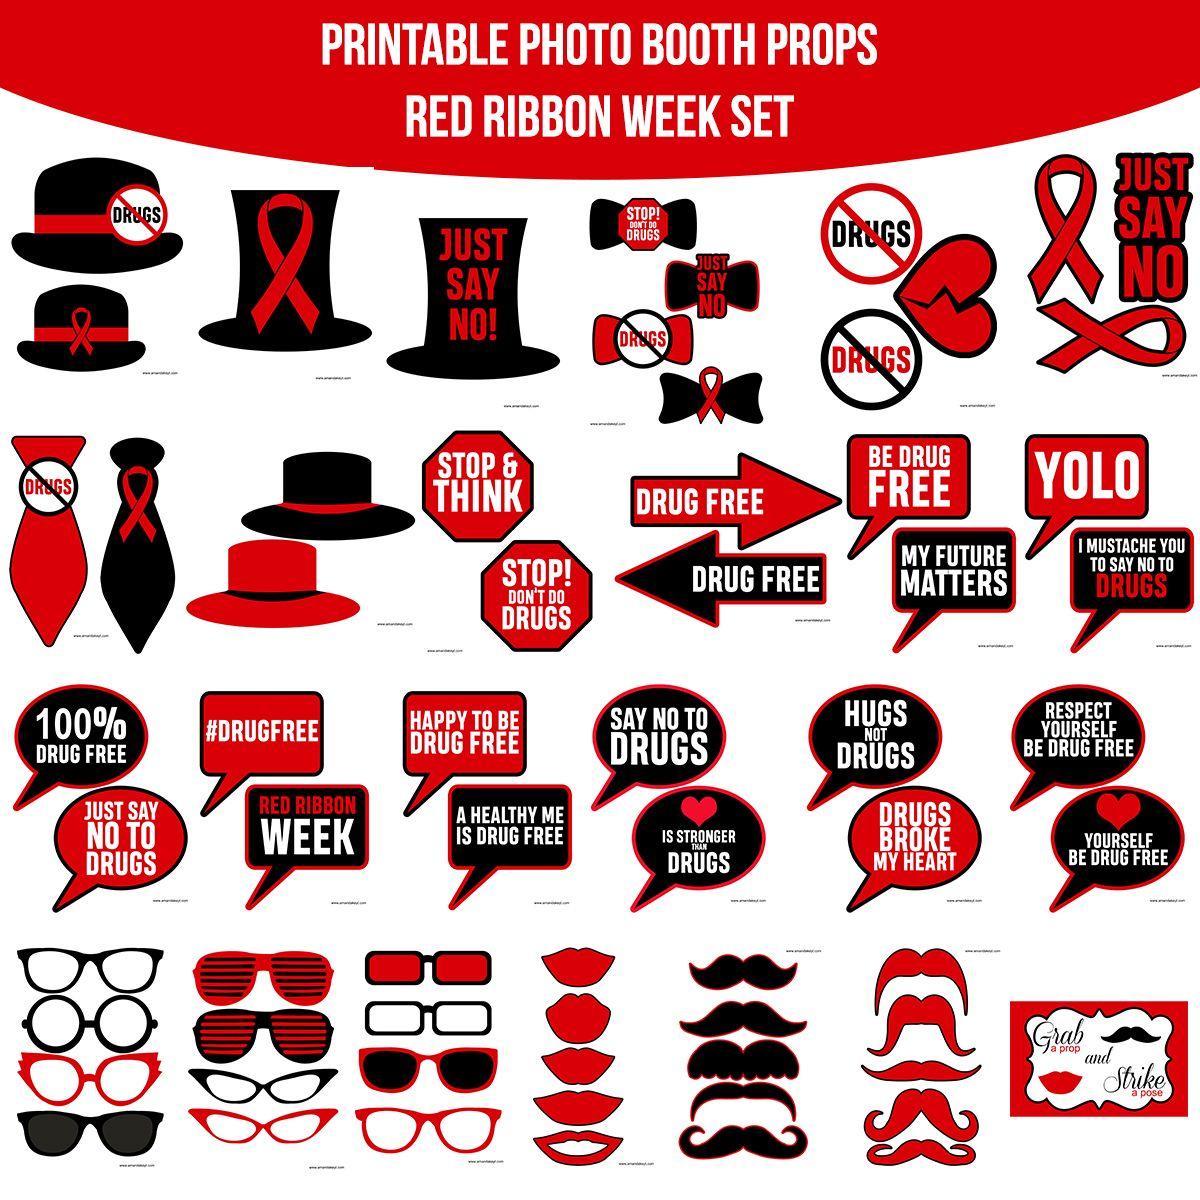 Red Ribbon Week Red Ribbon Photobooth Props Printable [ 1200 x 1200 Pixel ]